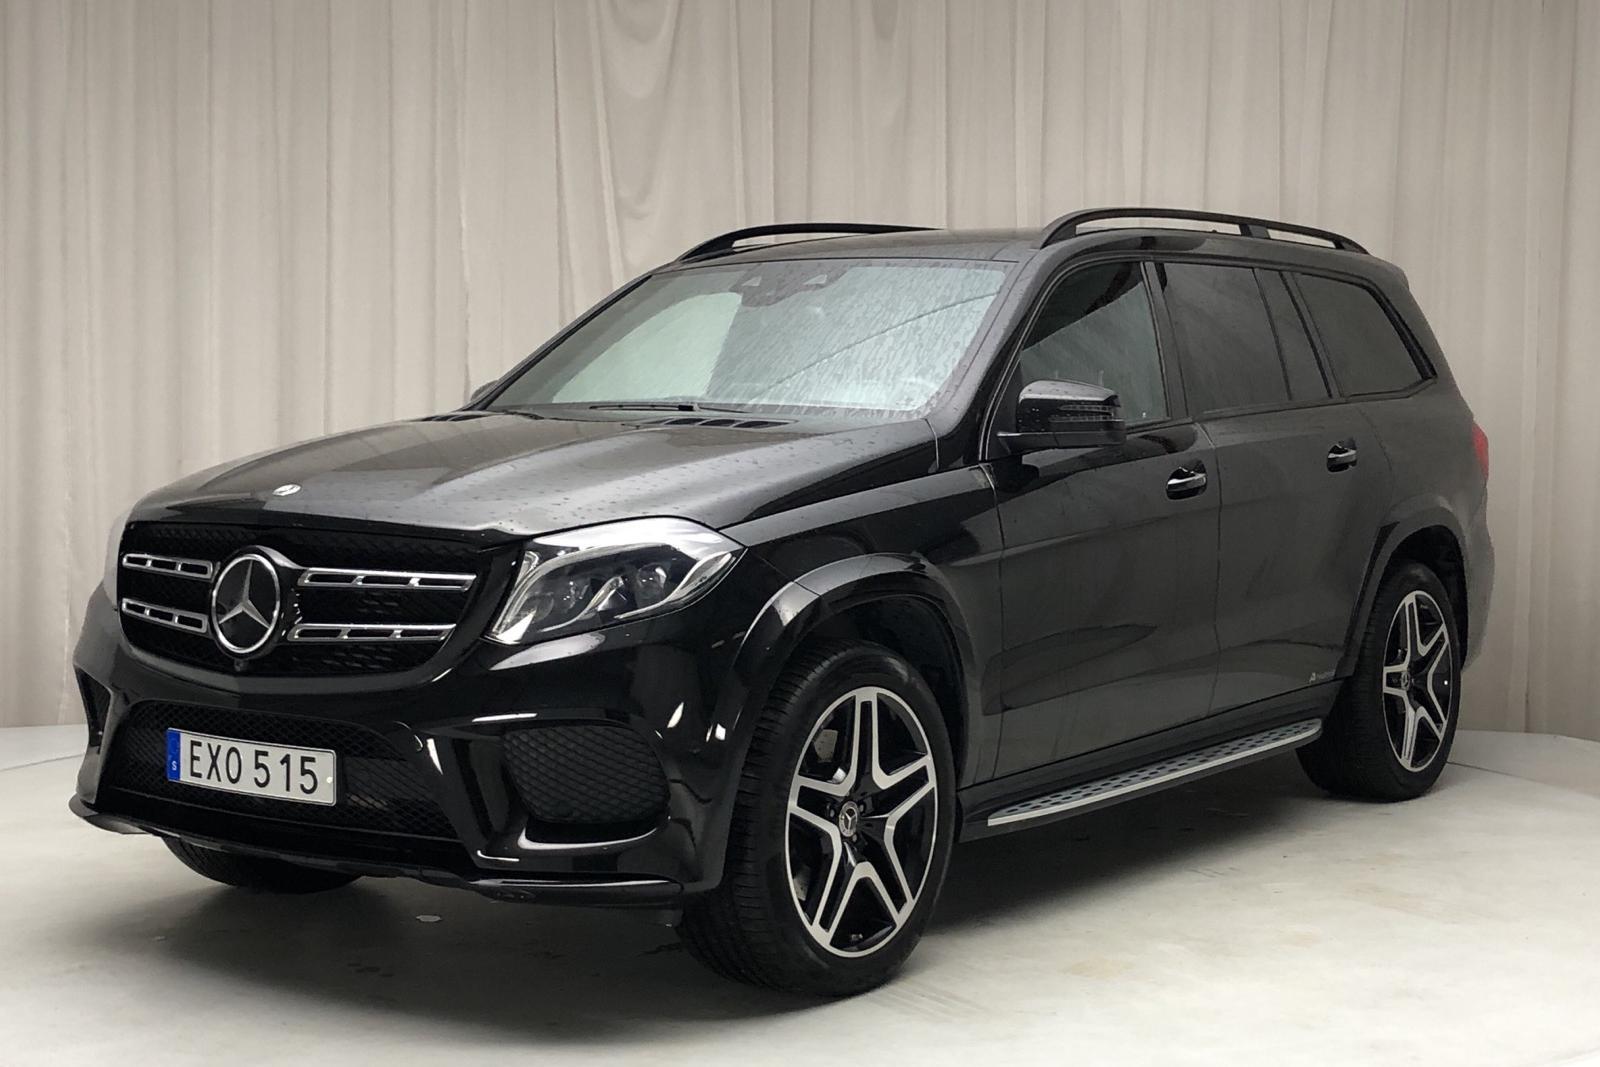 Mercedes GLS 350 d 4MATIC X166 (258hk) - 0 km - black - 2018